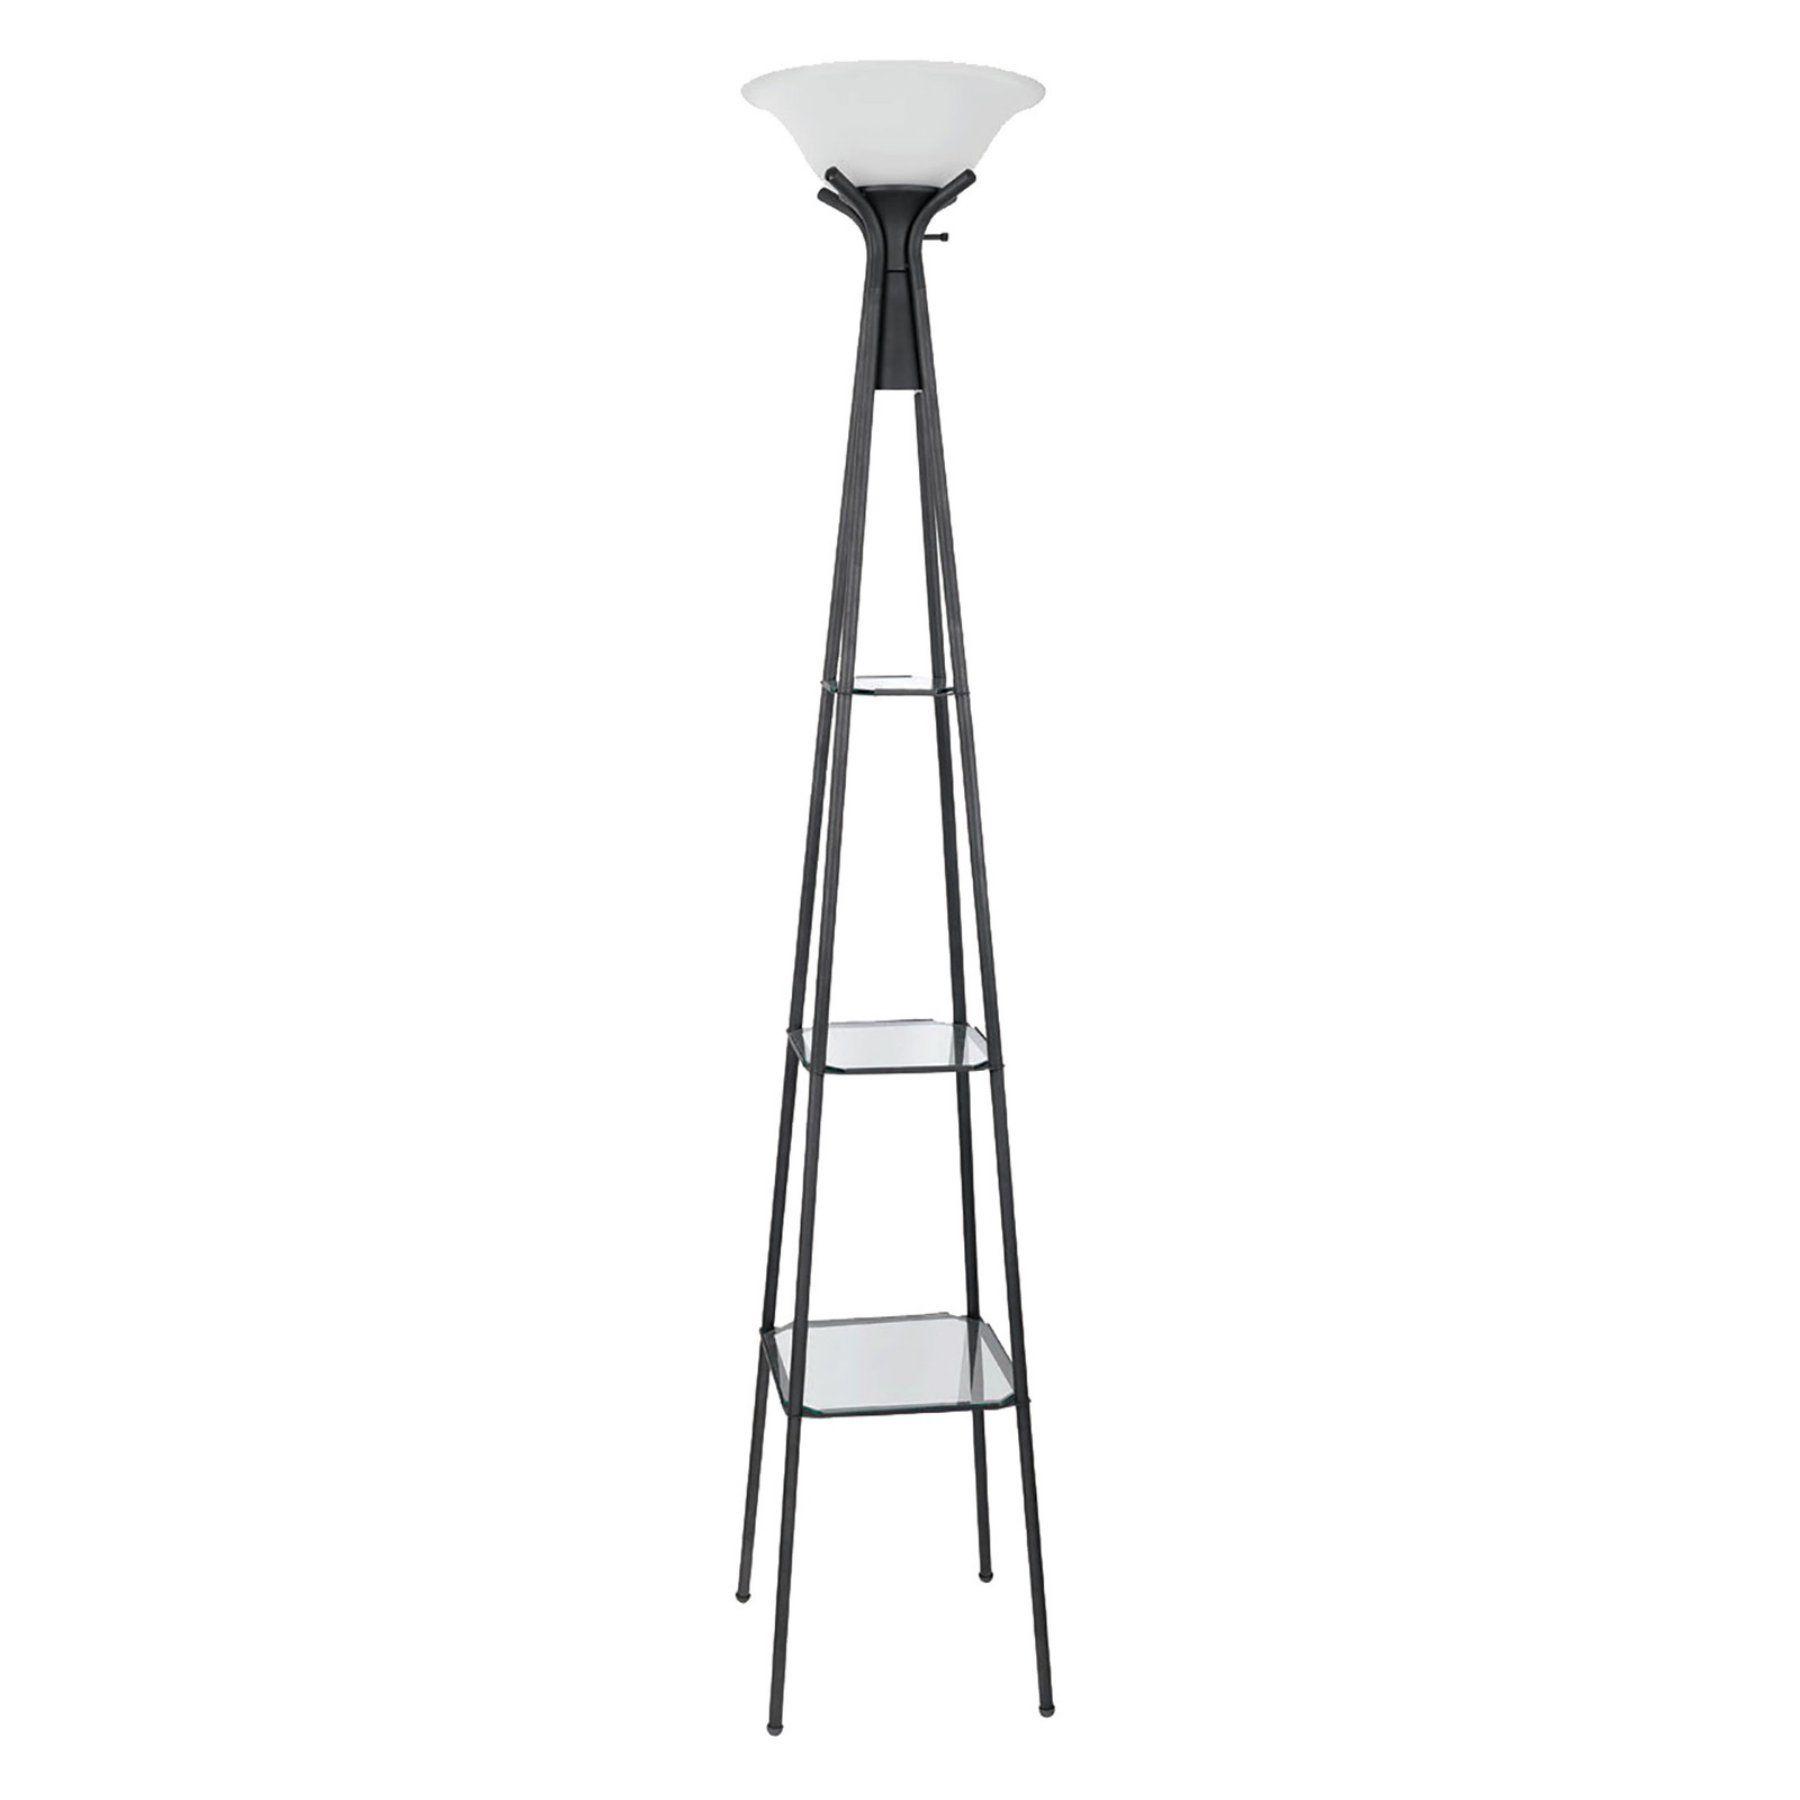 Coaster Company Of America 901420 Floor Lamp